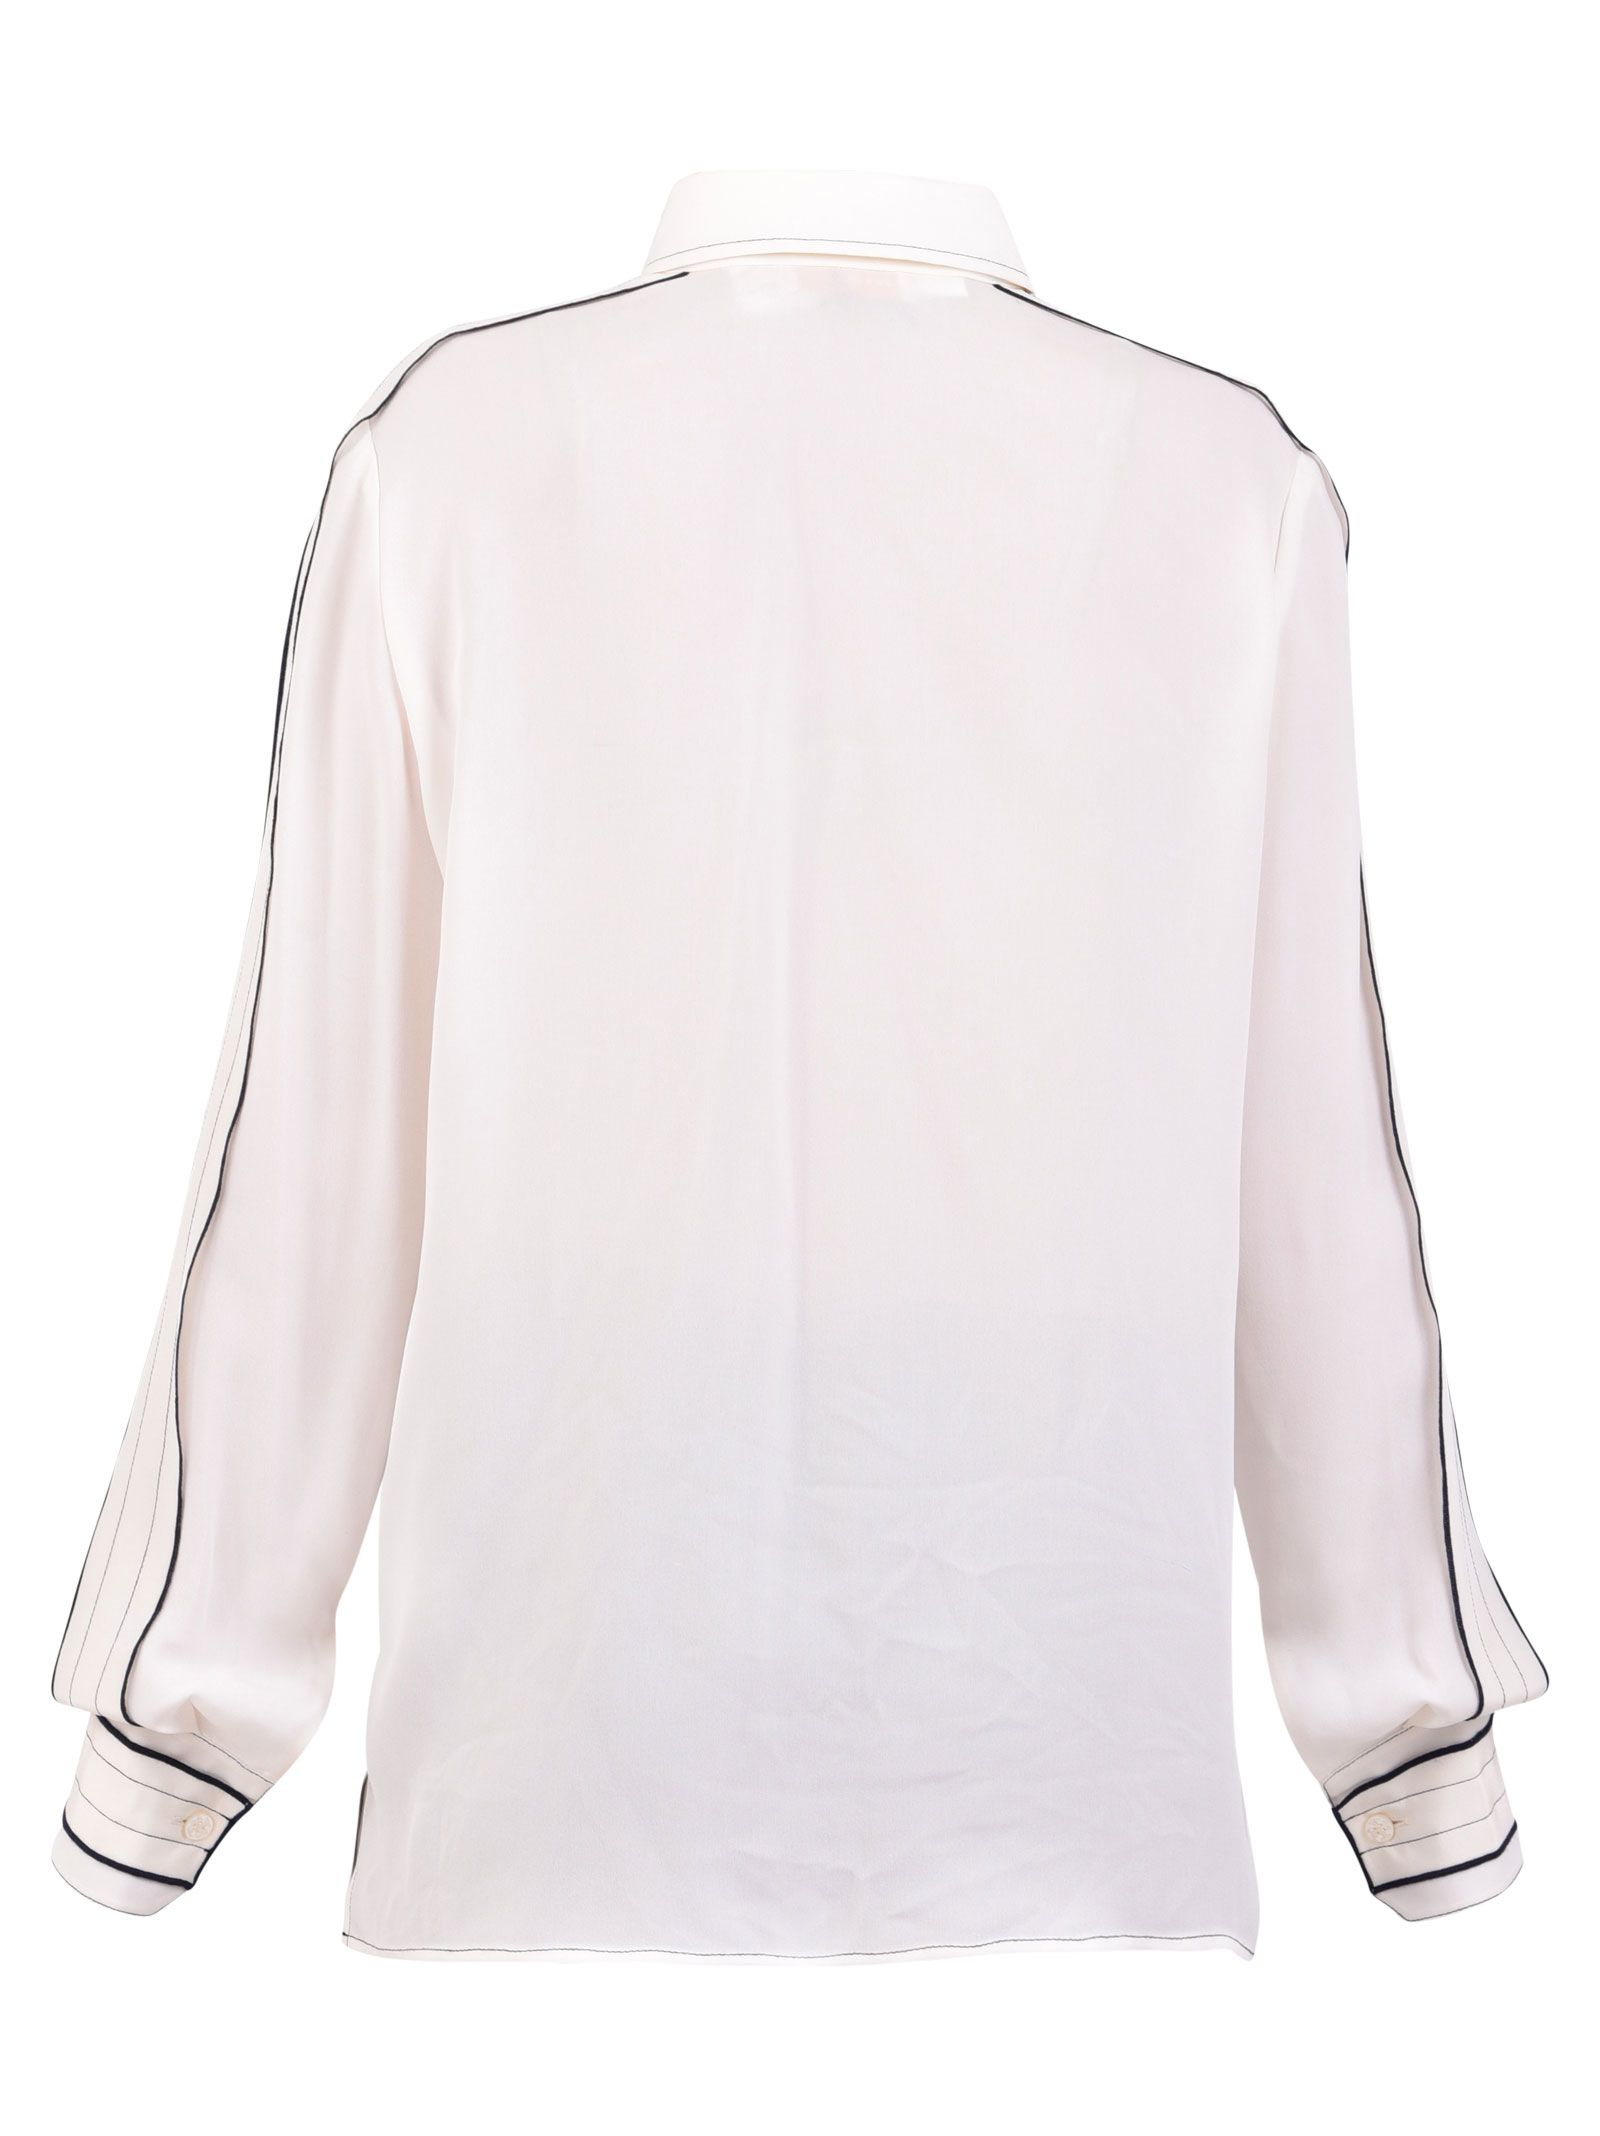 cb1fd65595906 Tory Burch Tory Burch Silk Shirt - White - 10851556